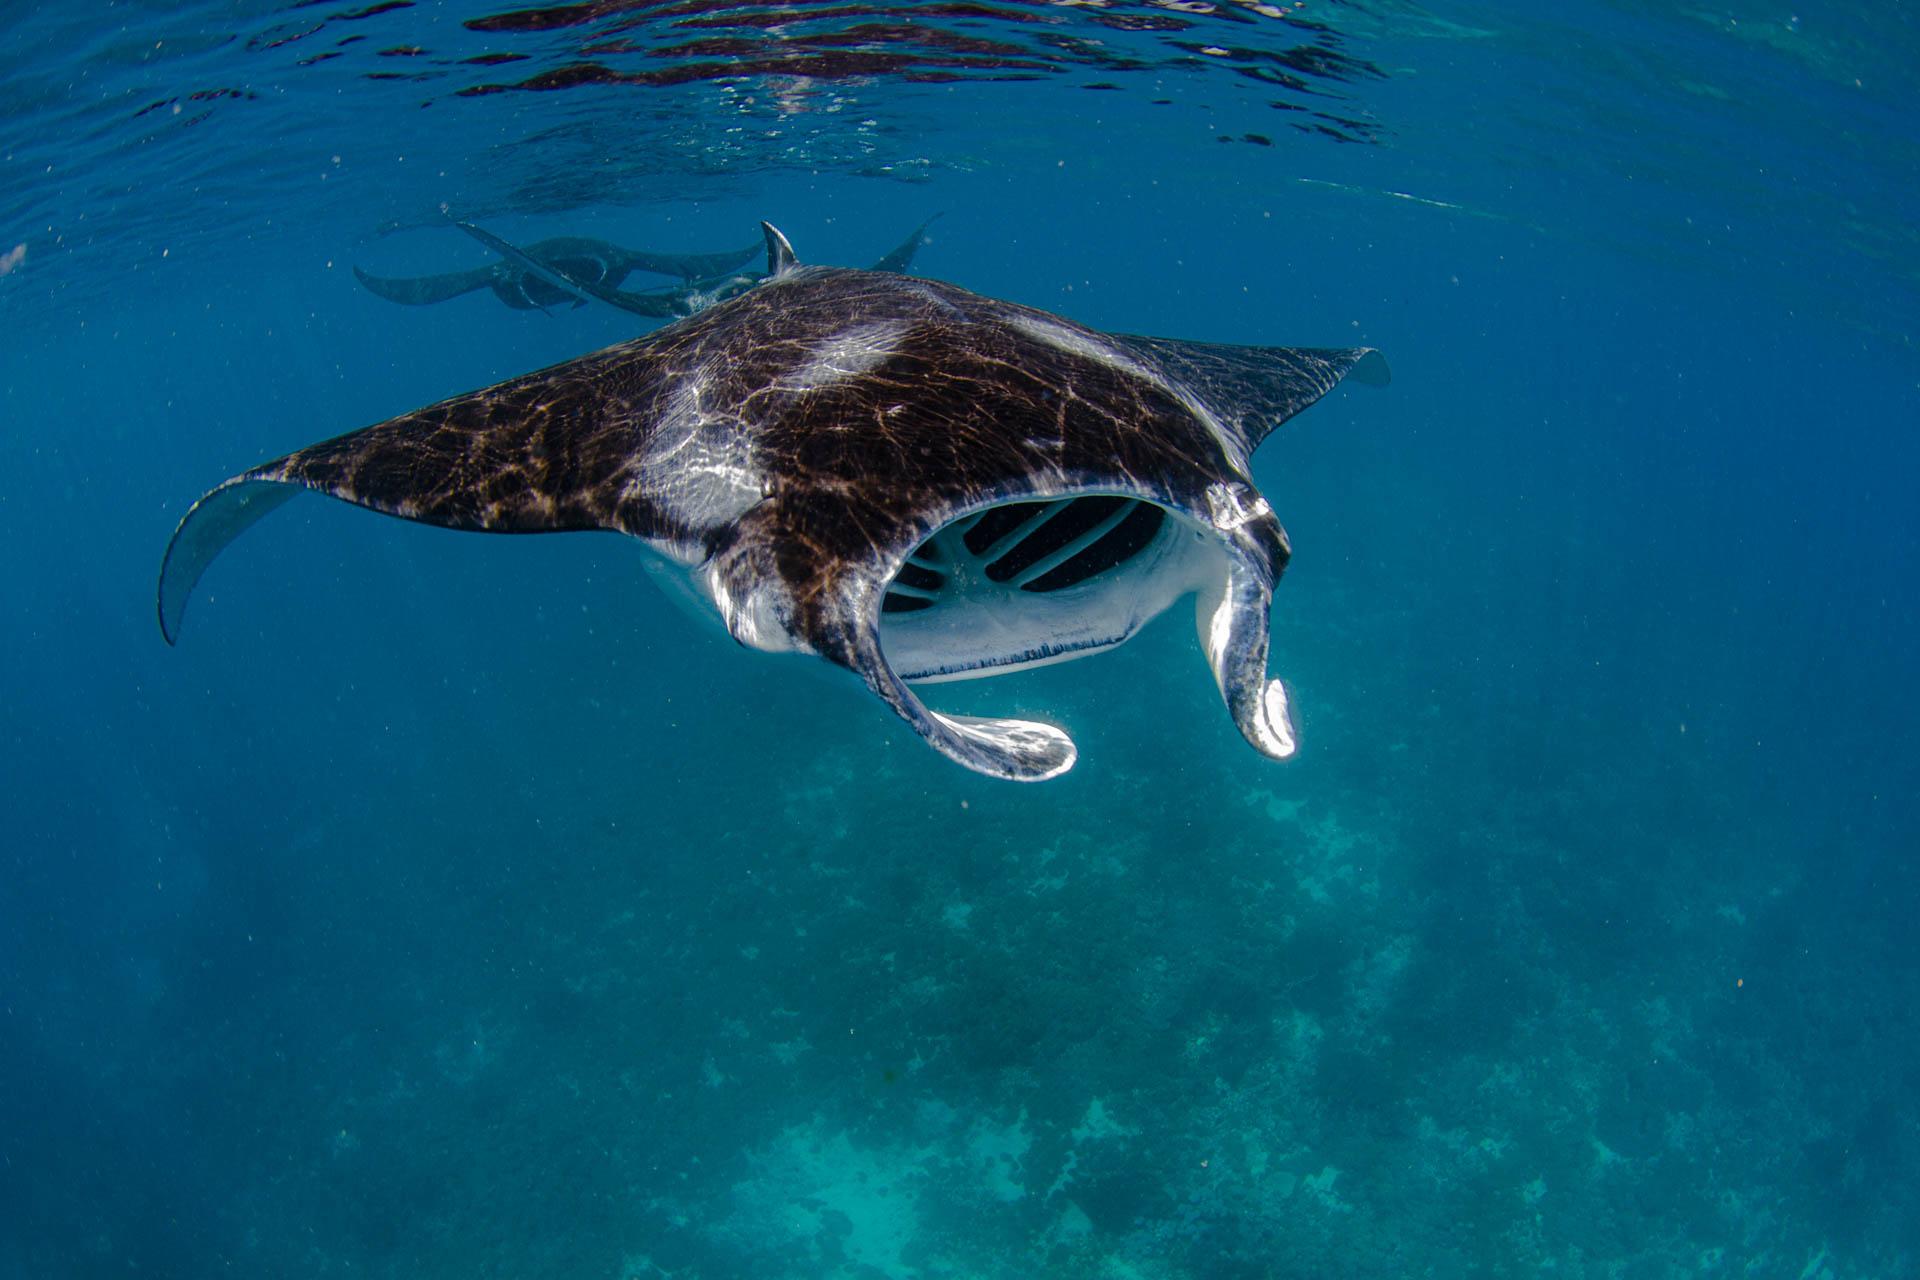 manta rays feeding on the surface